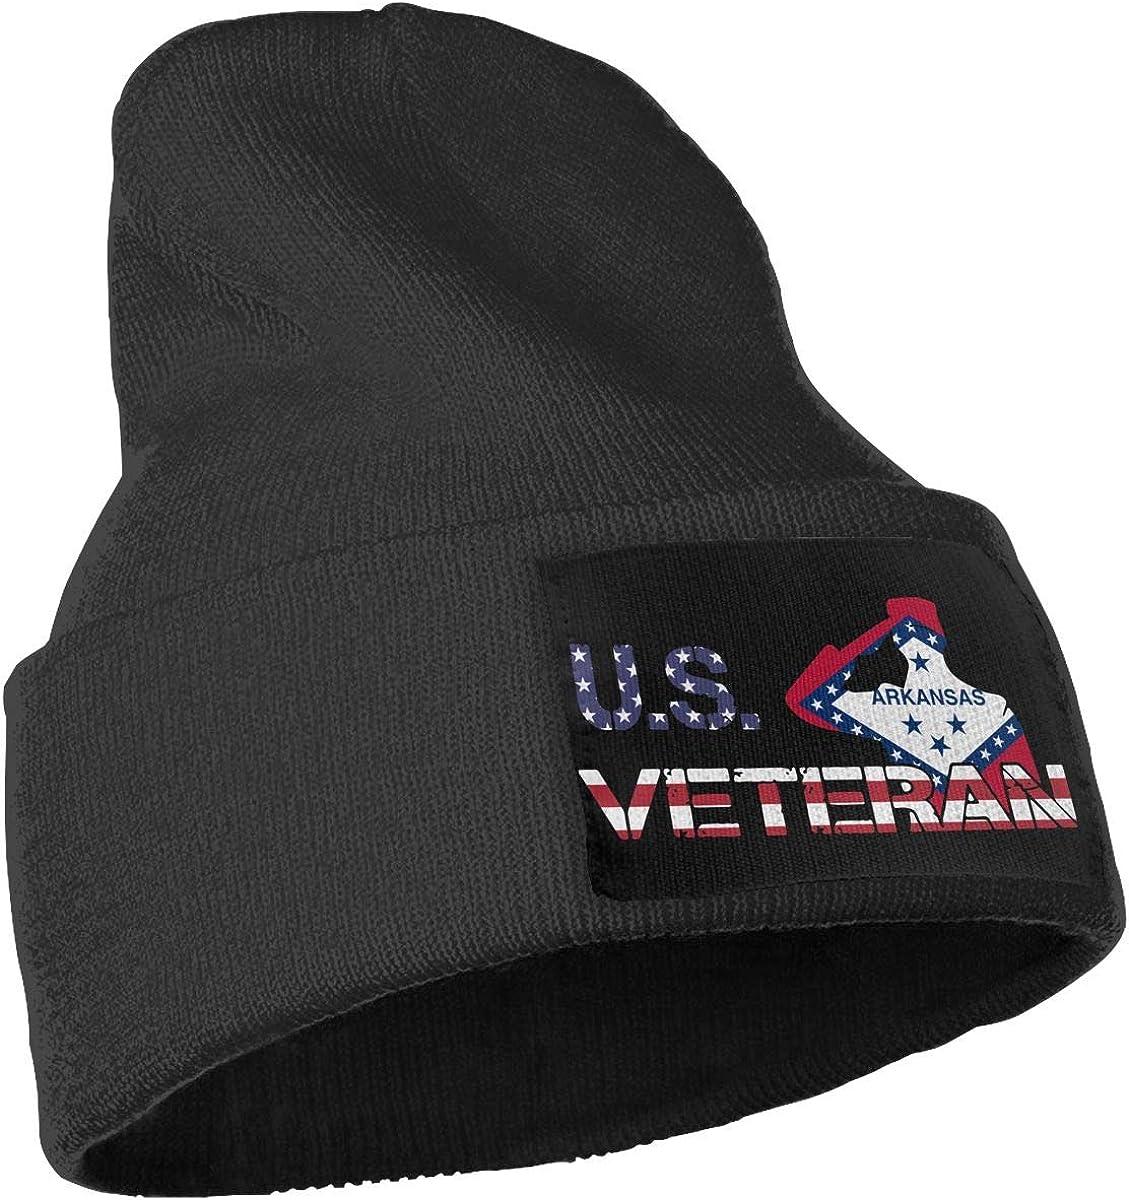 COLLJL-8 Unisex American Veterans Day Arkansas Flag Outdoor Fashion Knit Beanies Hat Soft Winter Skull Caps